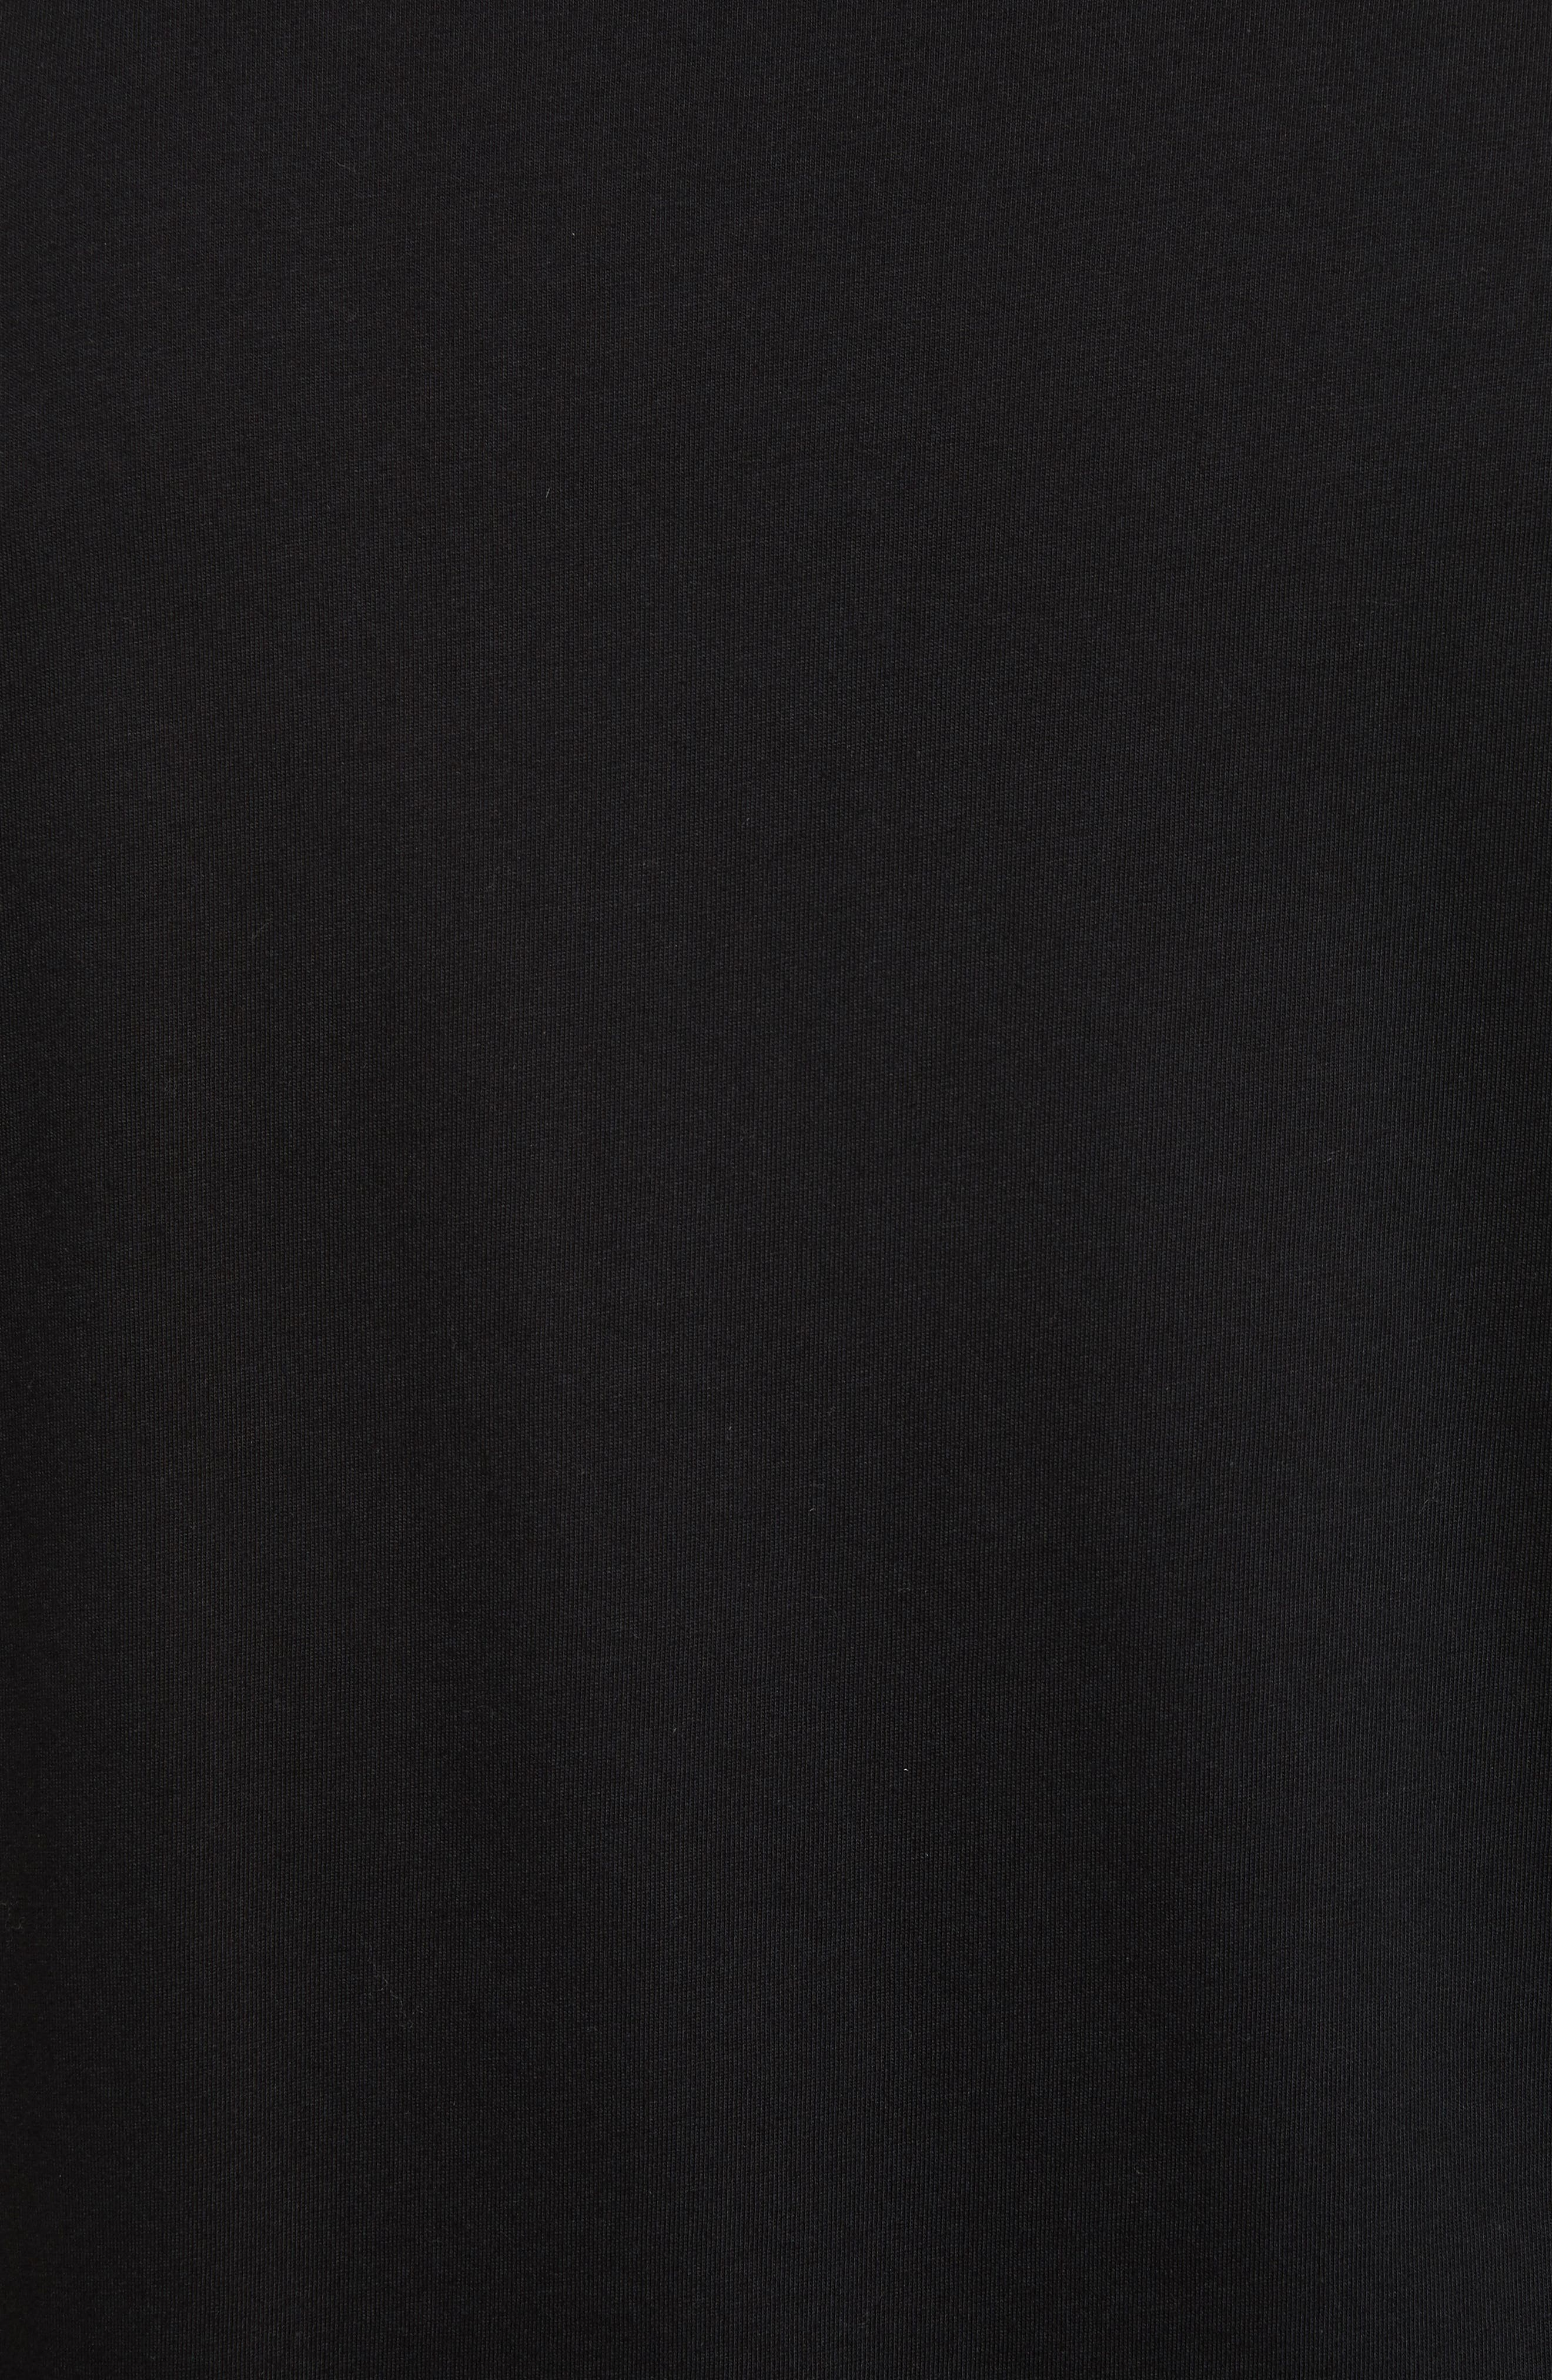 PS Graphic T-Shirt,                             Alternate thumbnail 5, color,                             Black